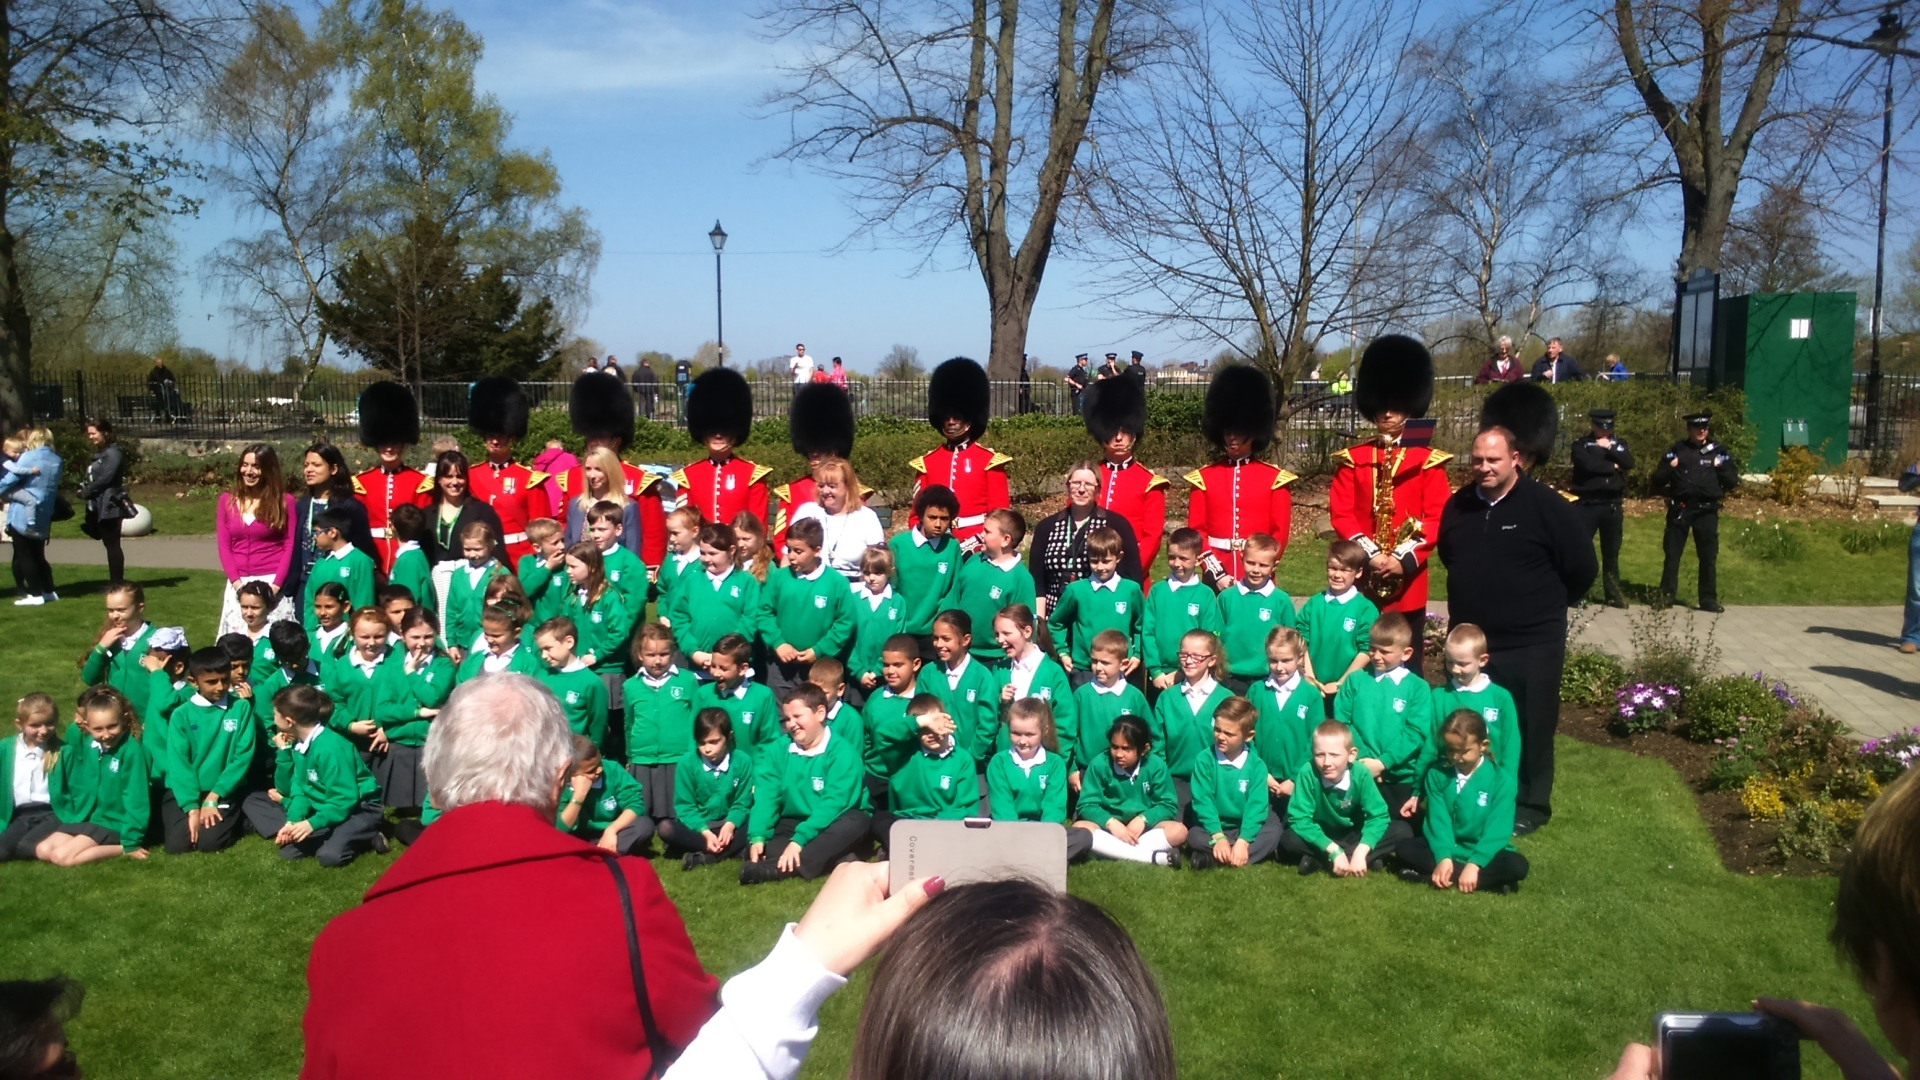 dedworth green first school irish guards band #queenat90